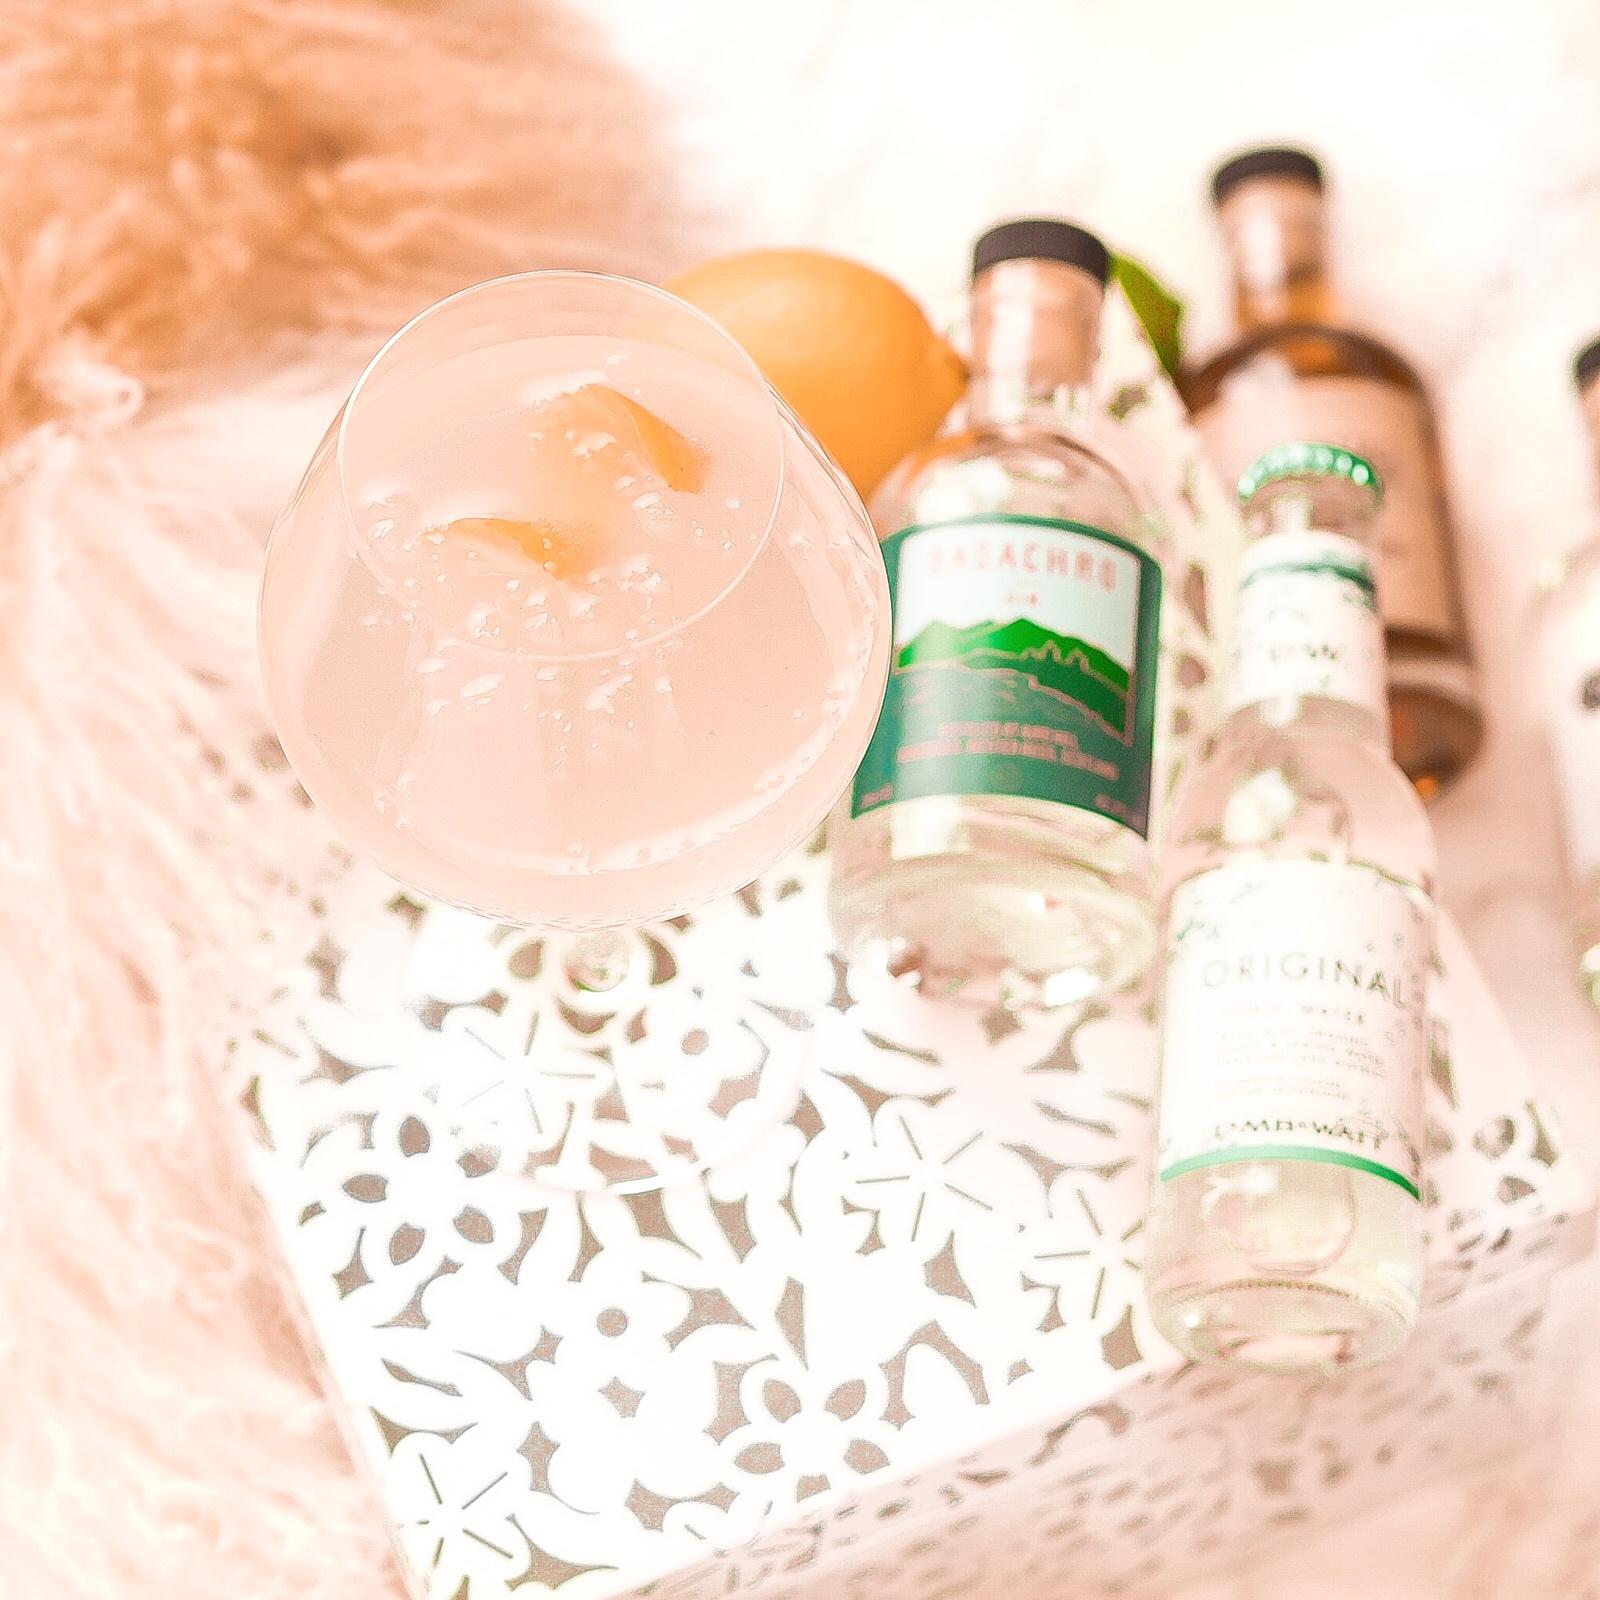 Gin & Elderflower sherbet recipe | Summer cocktail recipe | gin cocktails | gin cocktail recipe | the best summer cocktails | summer cocktail party ideas